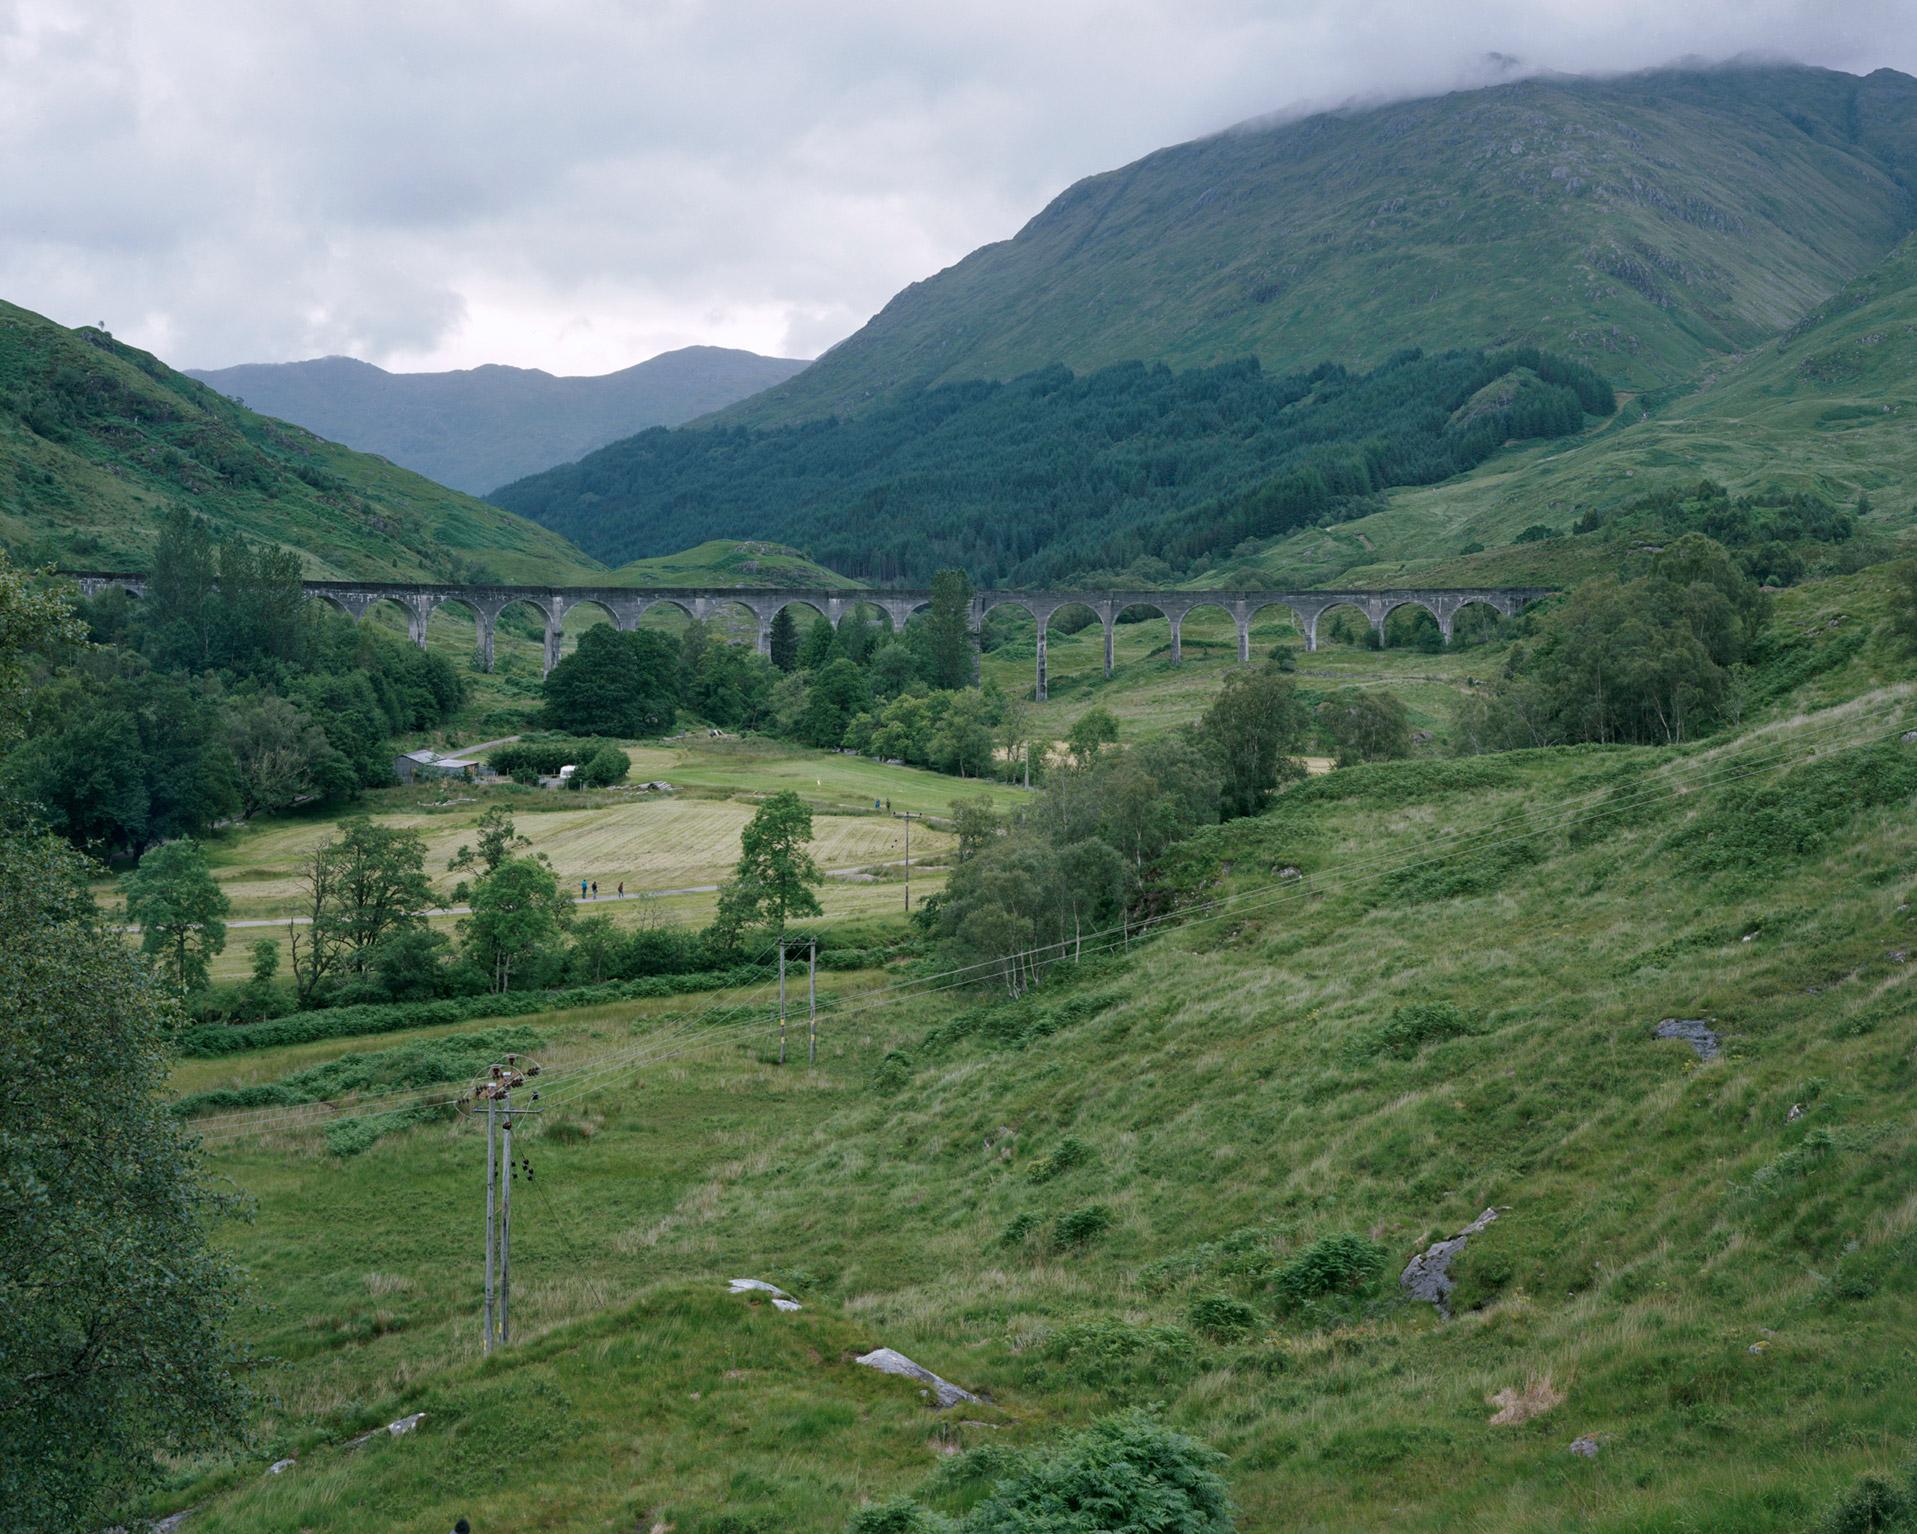 20170701_Scotland_CF10405-KodakPortra400_002.jpg